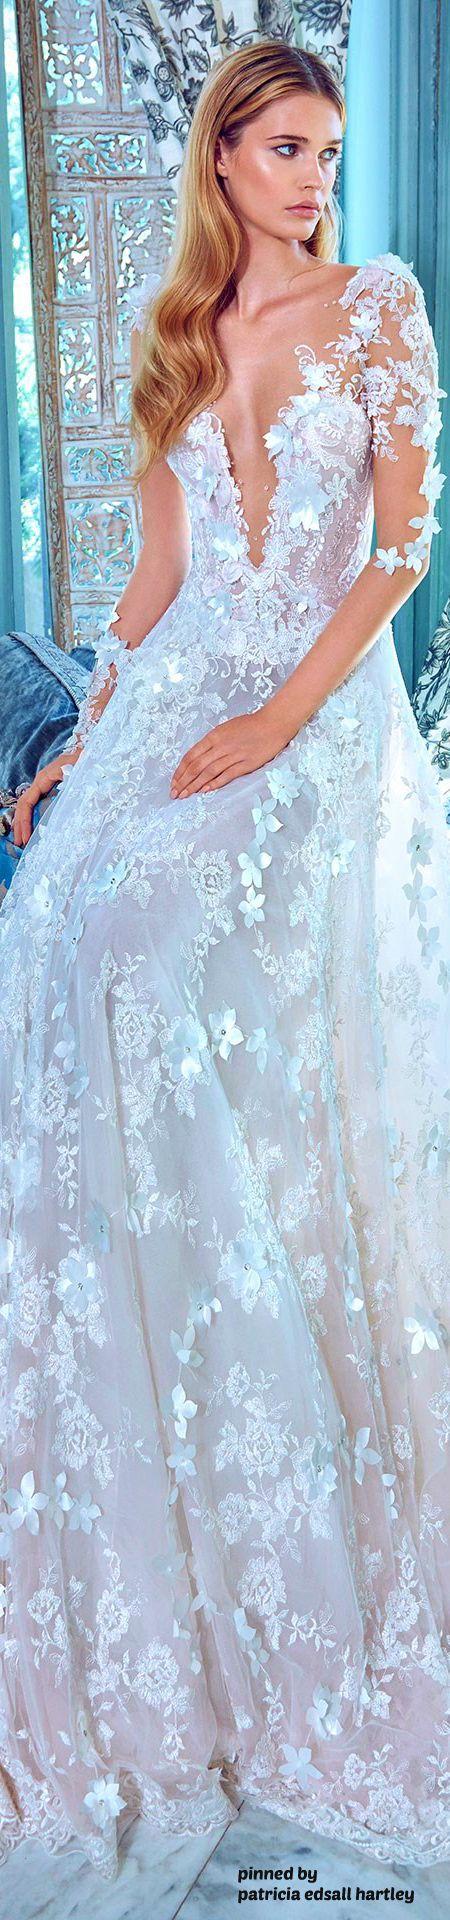 Magazine: Wedding Dress Pictures, Expert Wedding Planning Tips, Celebrity…